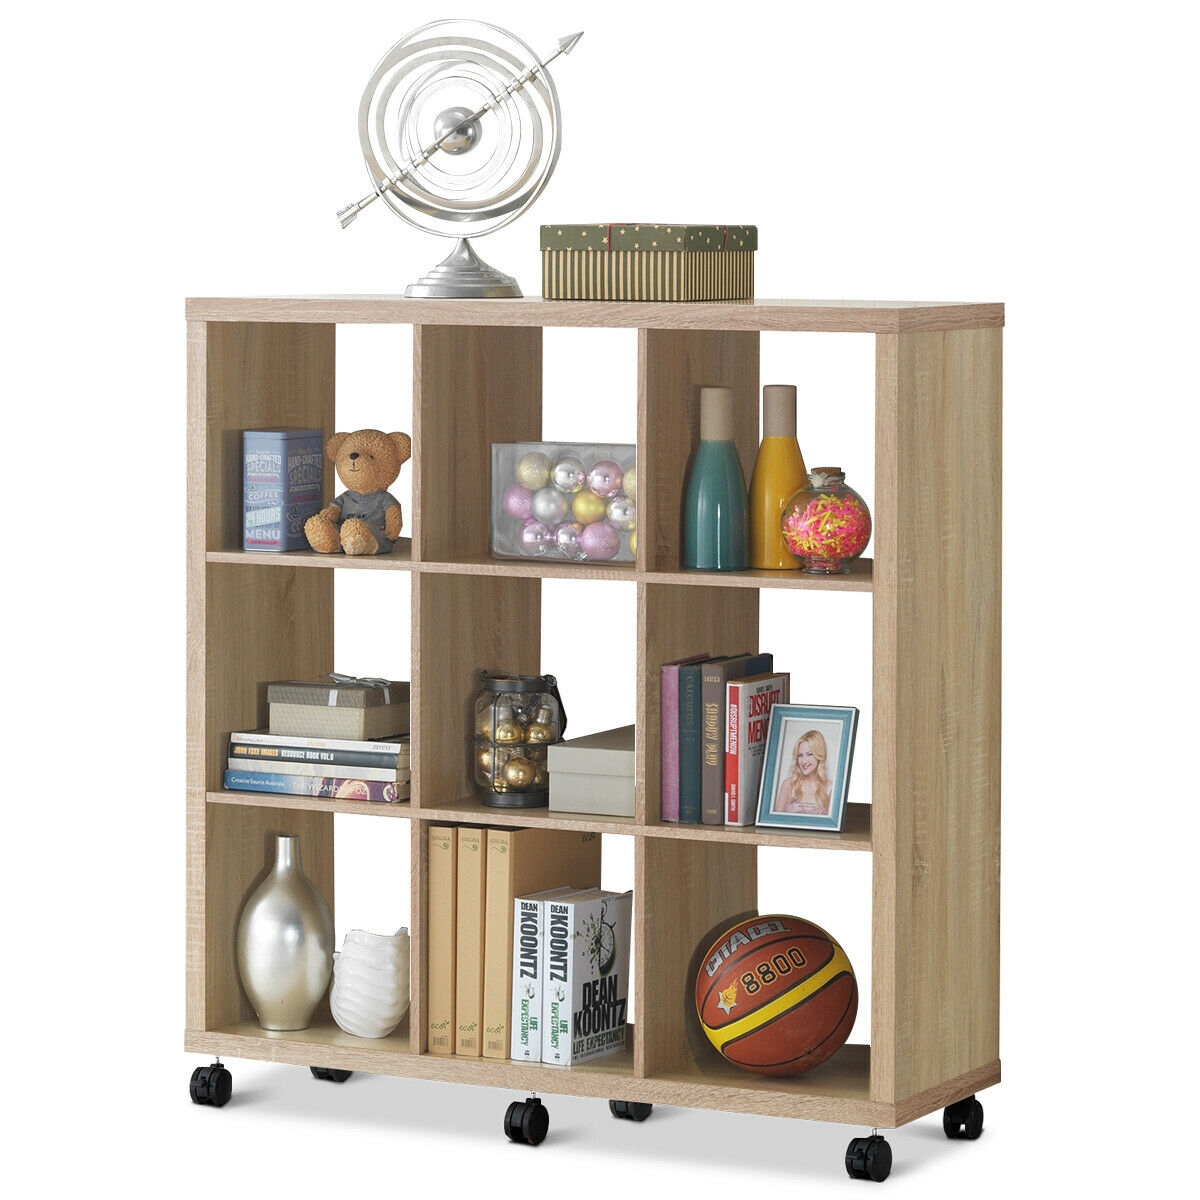 8 Cubes Ladder Shelf Freestanding Corner Bookshelf Display Rack Bookcase